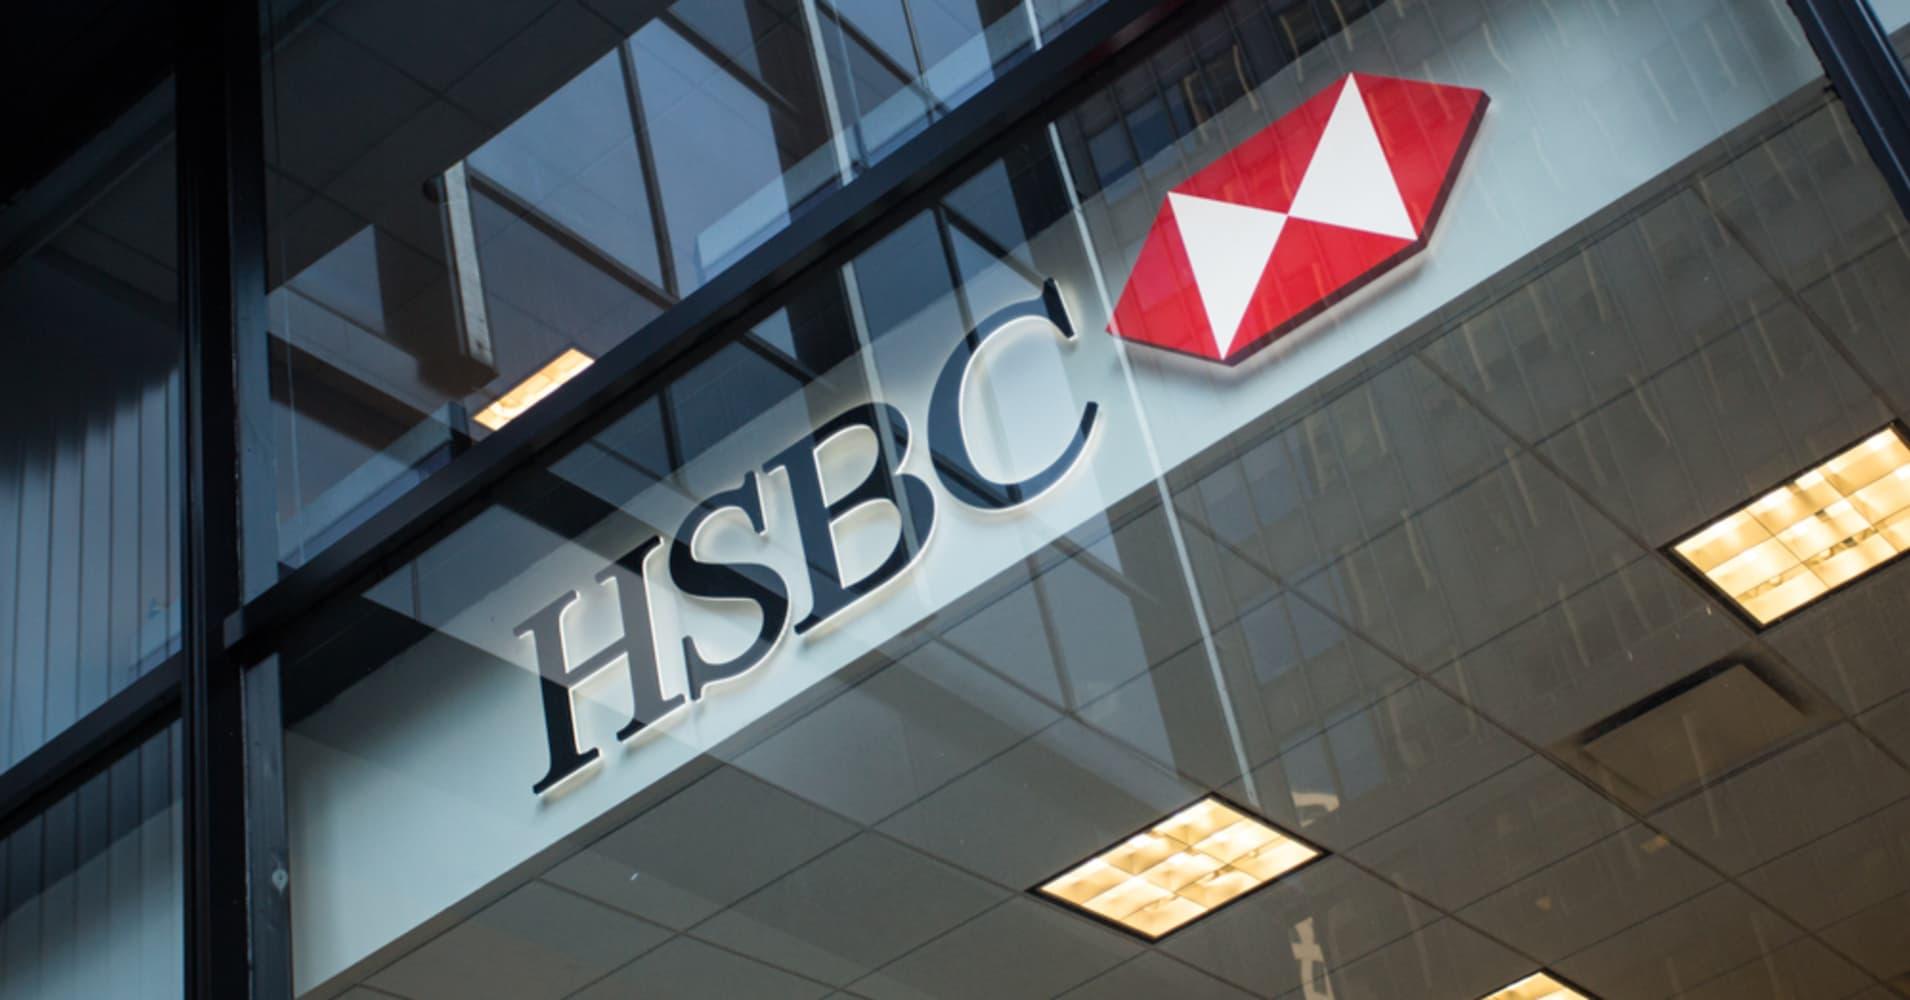 HSBC reports fourth-quarter, full-year 2017 earnings